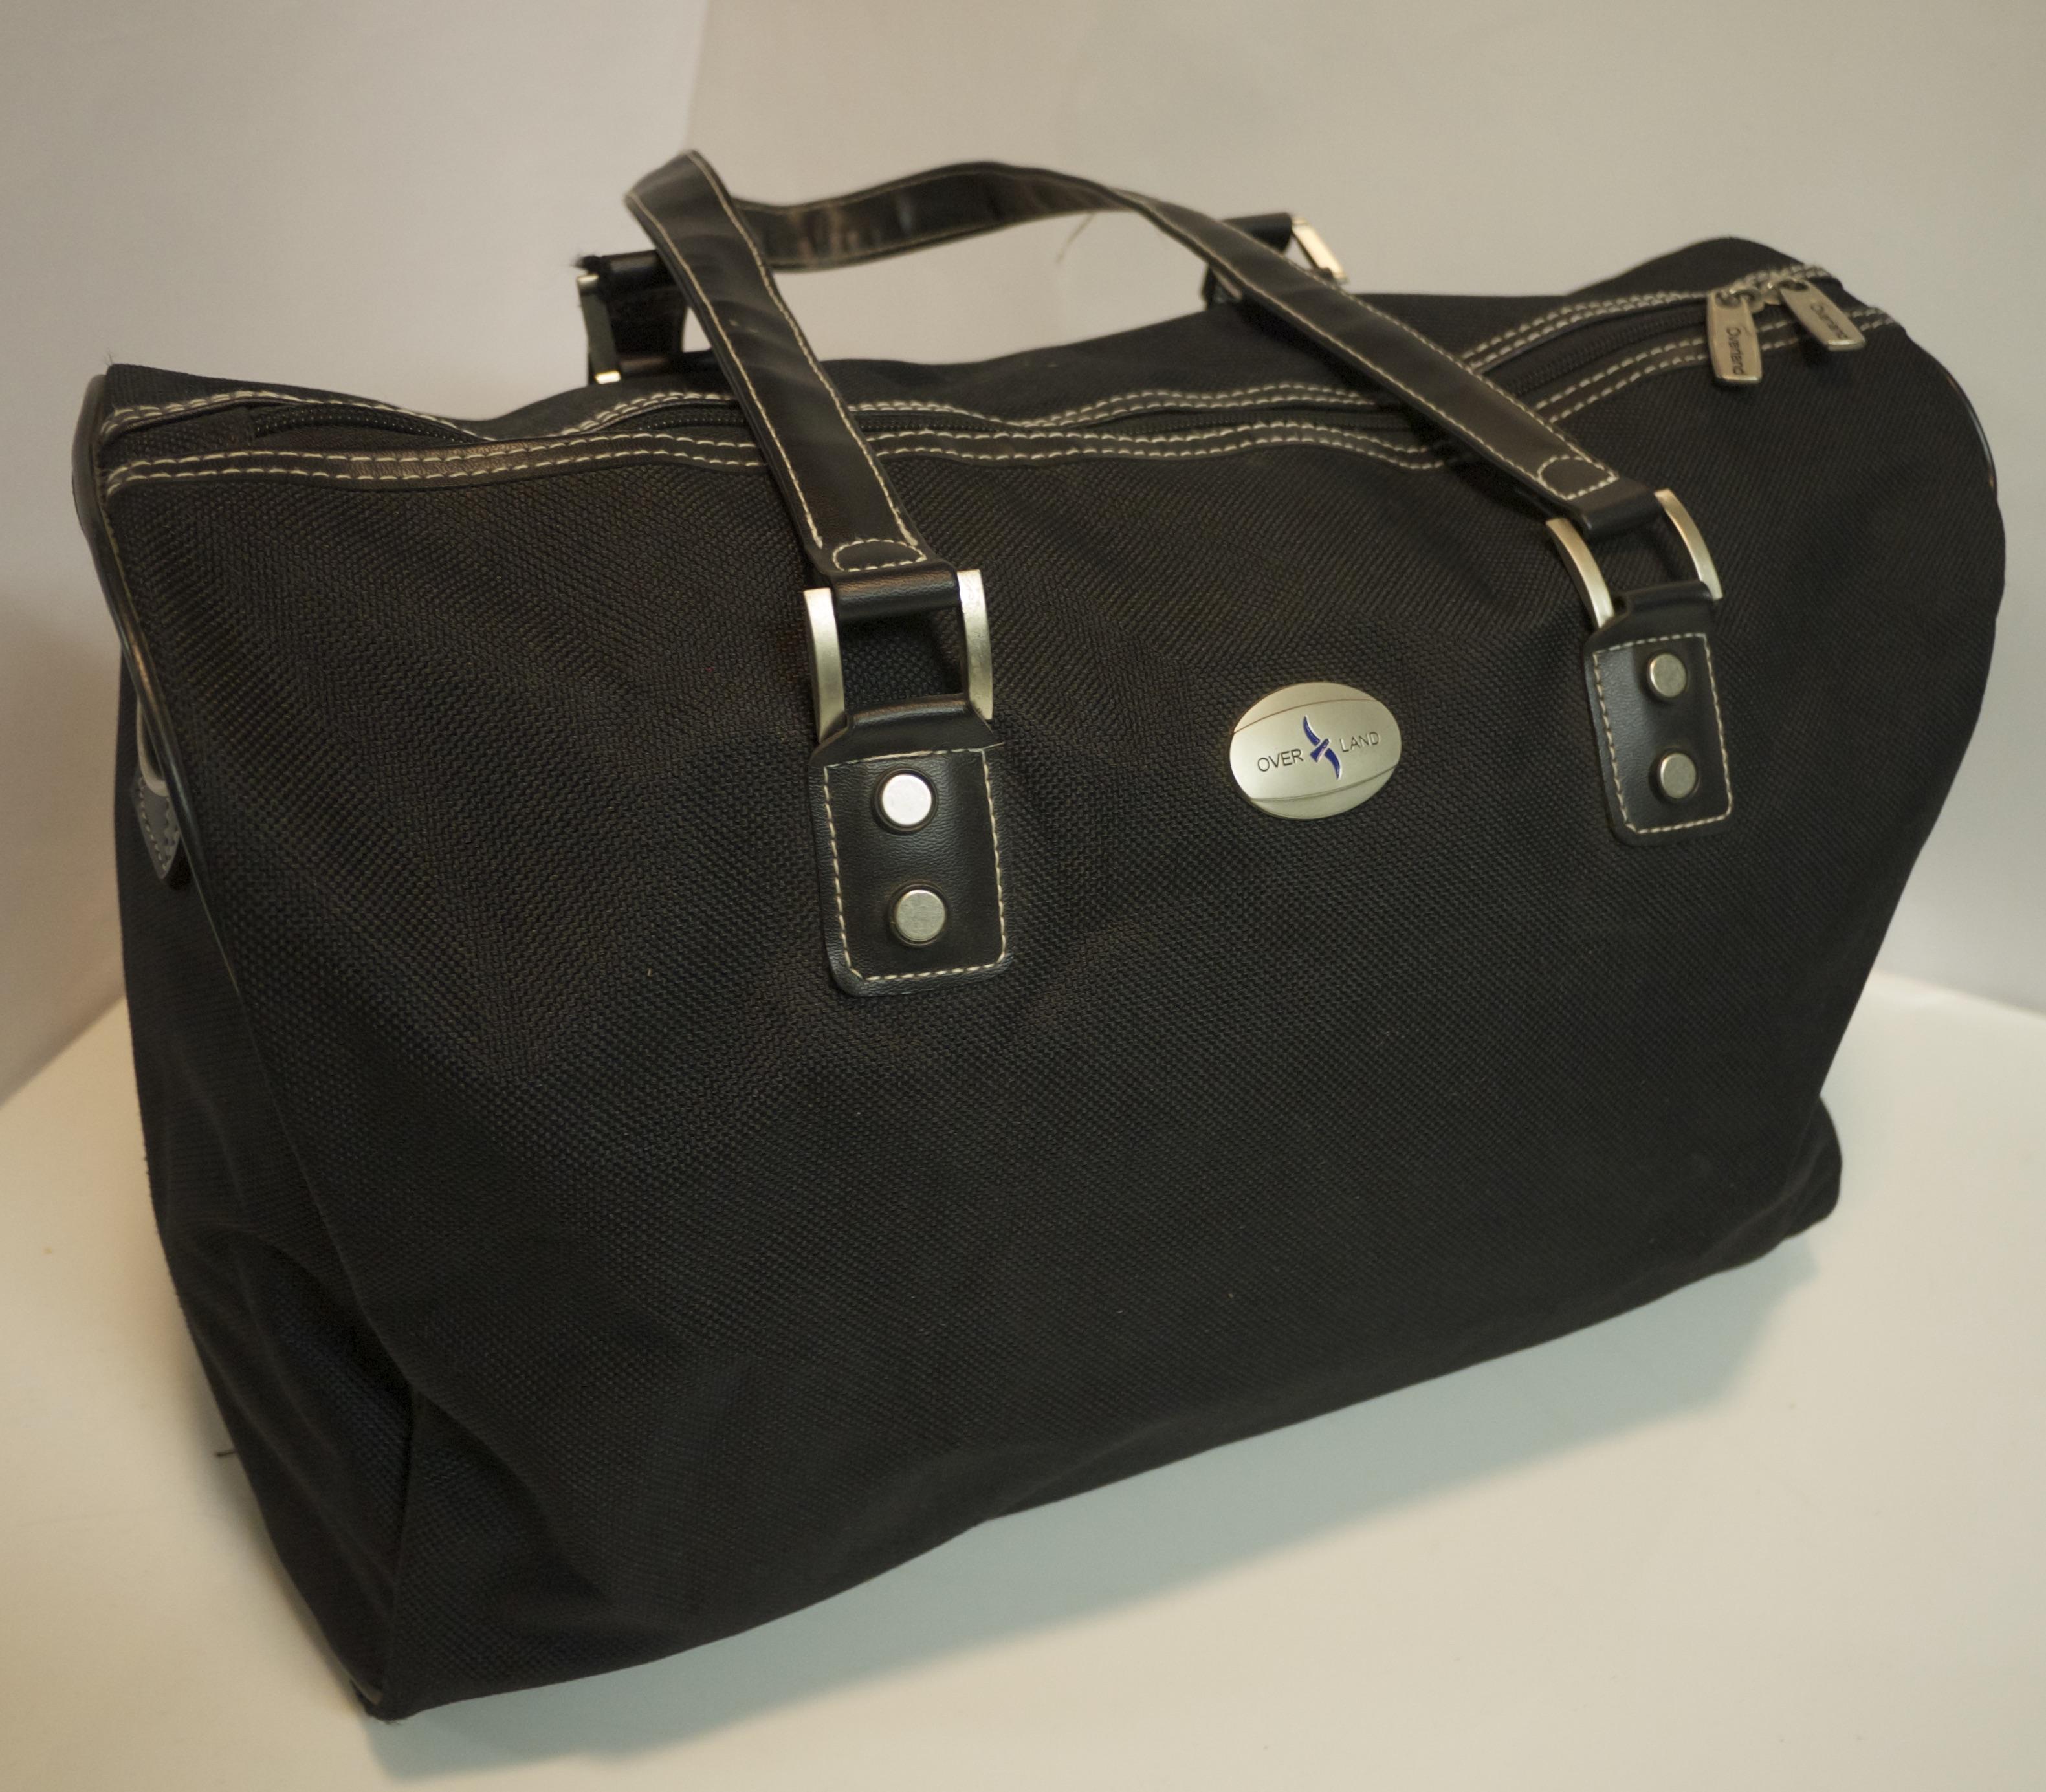 Med/Lg black travel bag